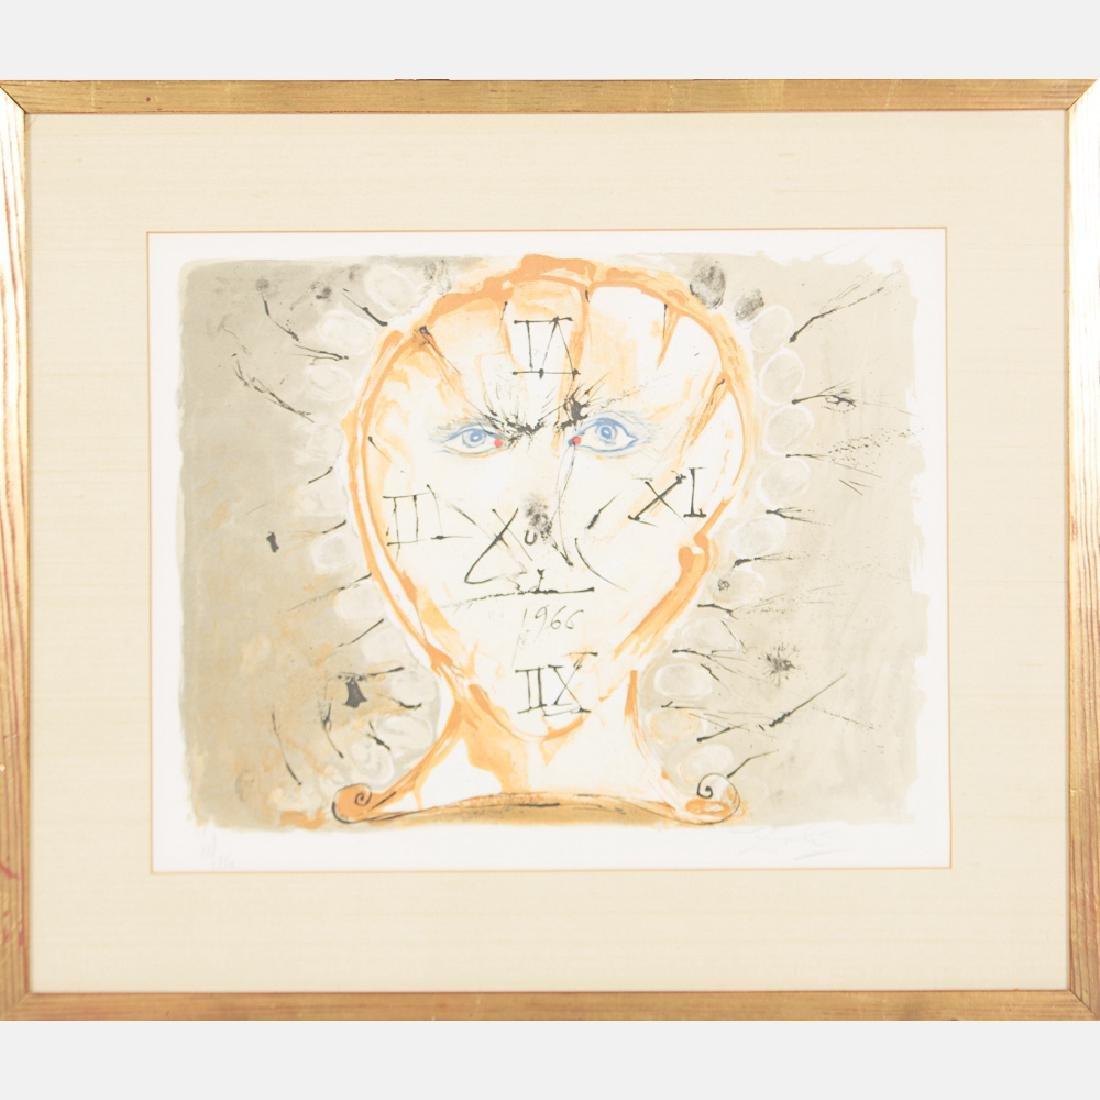 Salvador Dali (1904-1989) Self Portrait Sundial,